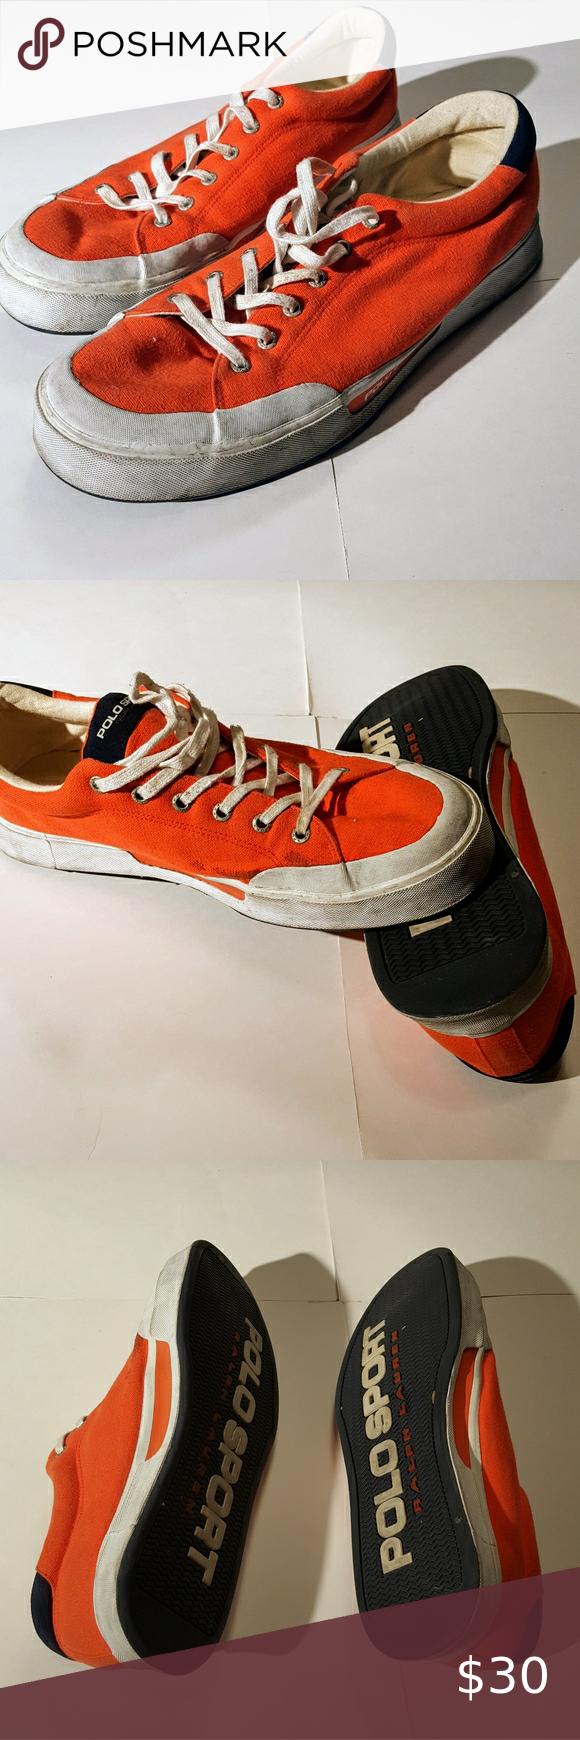 Nostalgic Polo Sport Neon Orange Sneakers Mens 13 In good used condition Has som…